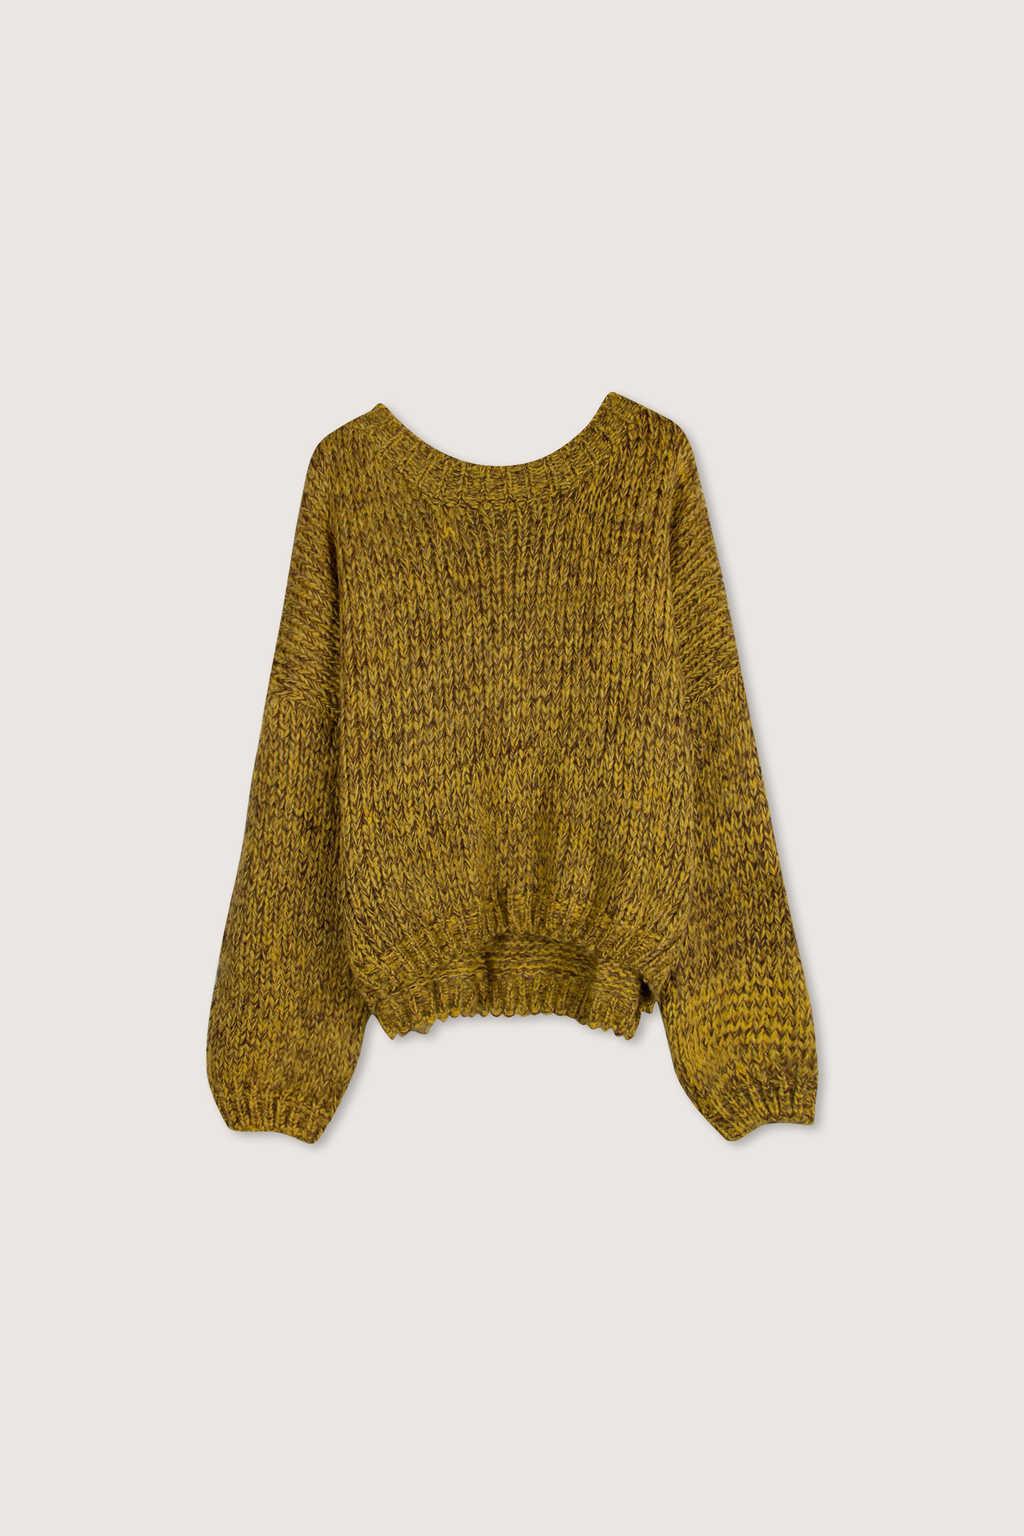 Sweater H076 Mustard 5